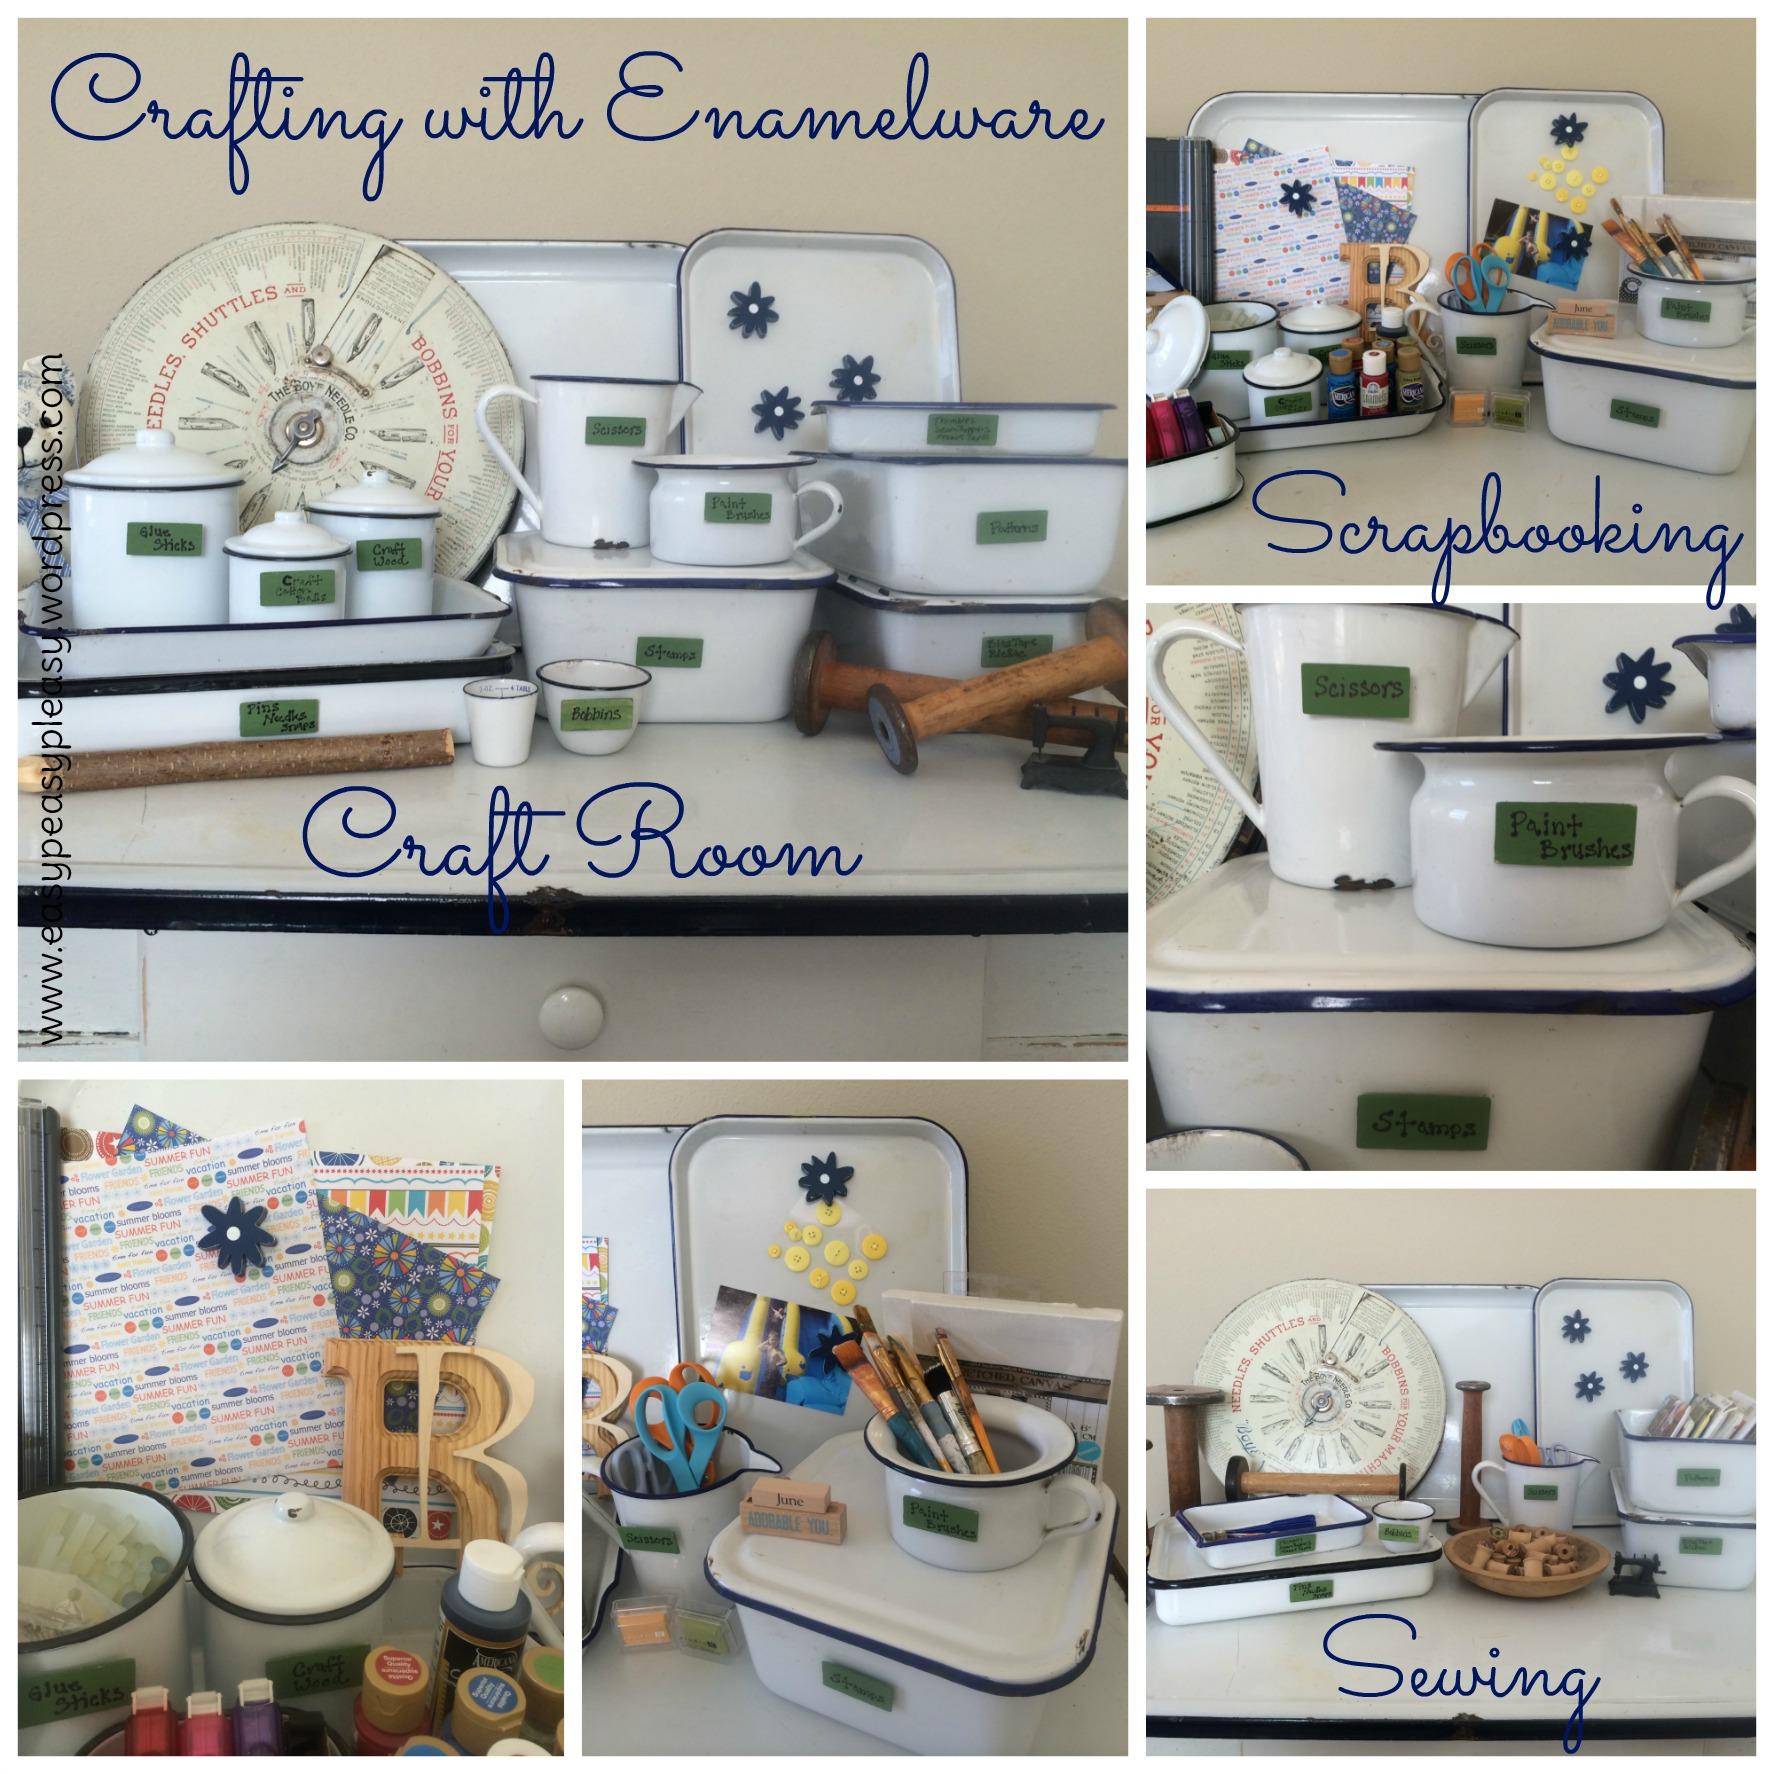 Vintage Enamelware Storage Ideas for the craft Room at https://easypeasypleasy.com